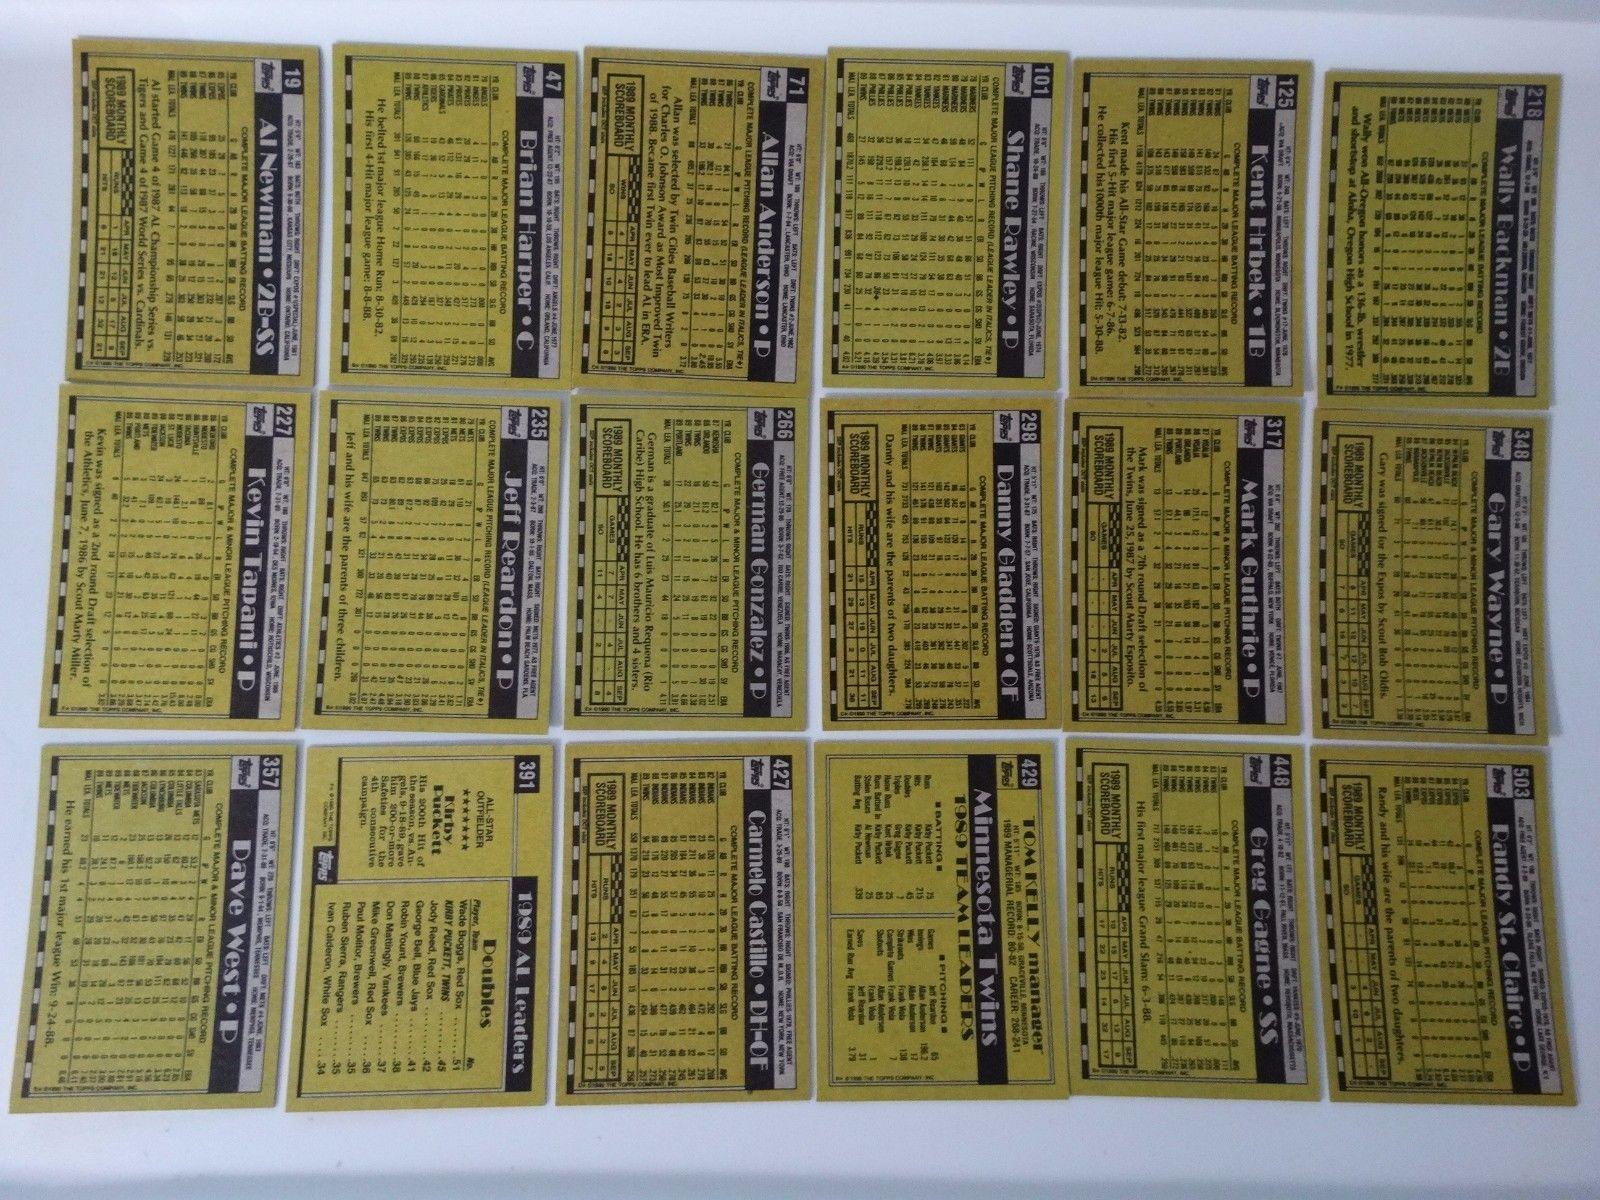 1990 Topps Minnesota Twins Team Set of 30 Baseball Cards image 4